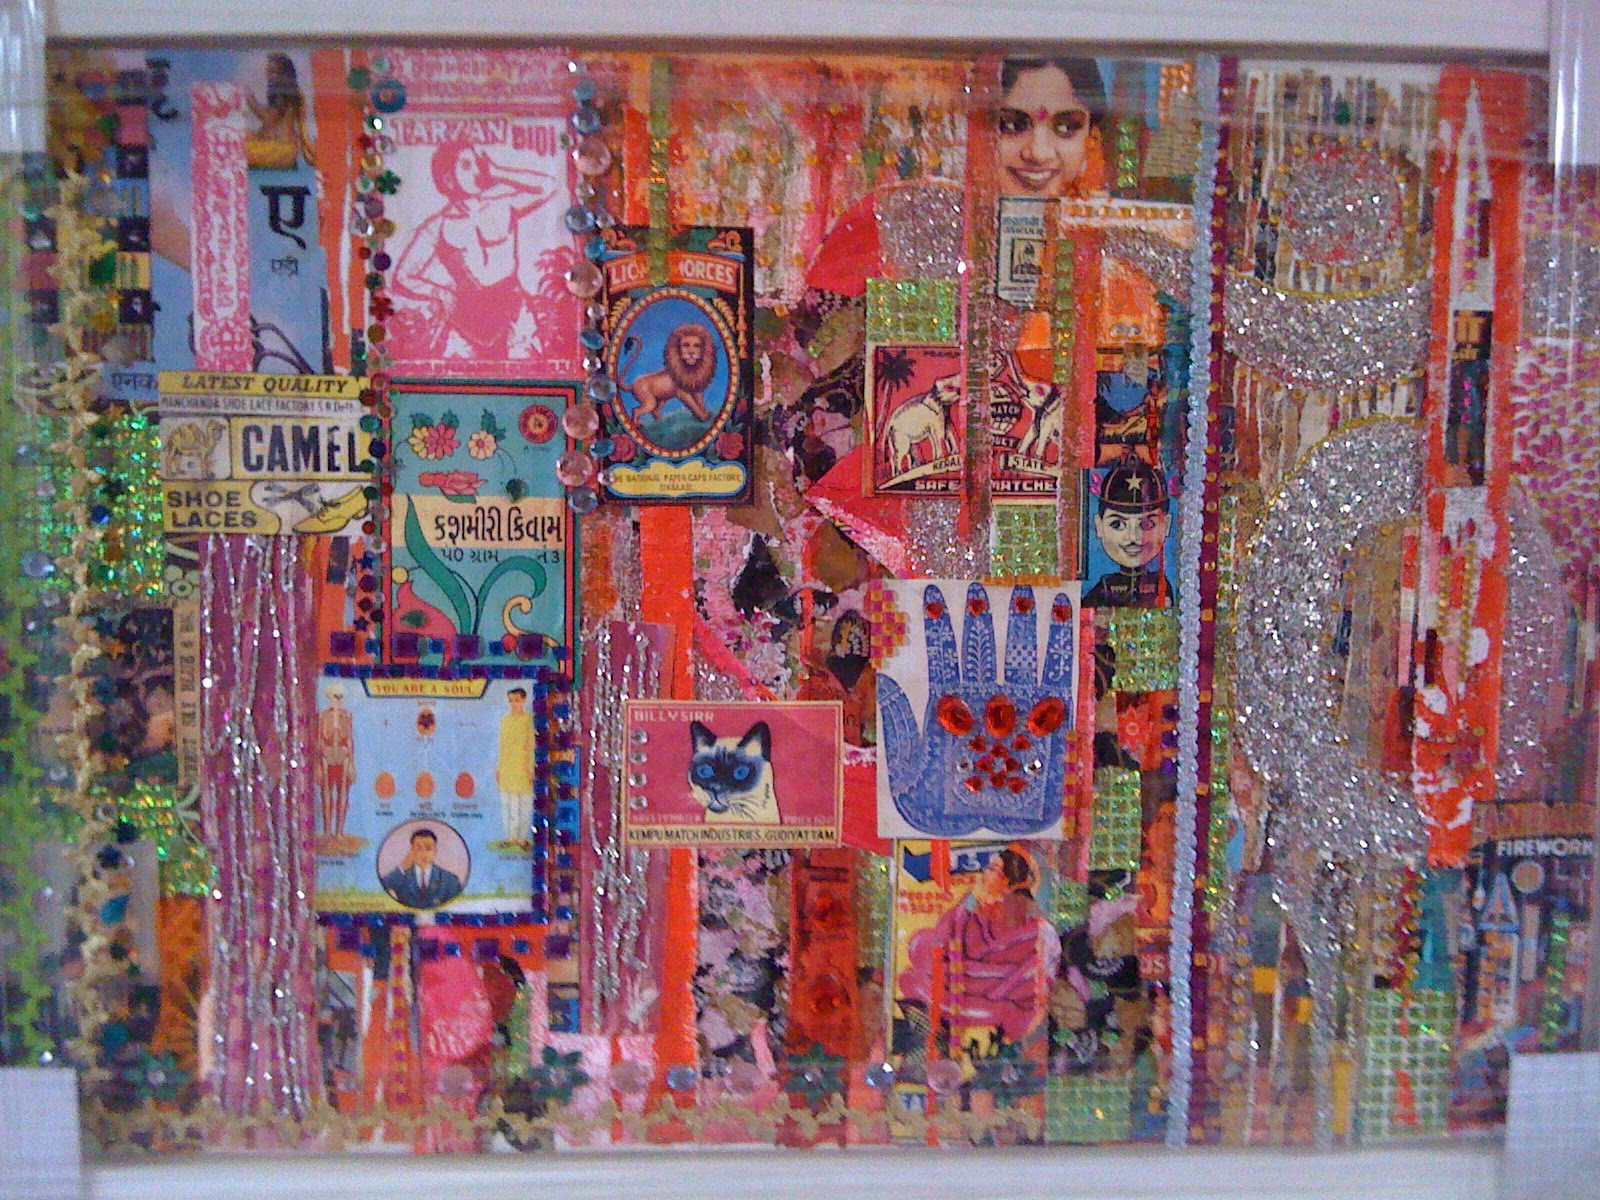 Elspeth Gliksten Art Indian Mixed Media Collage On Canvas